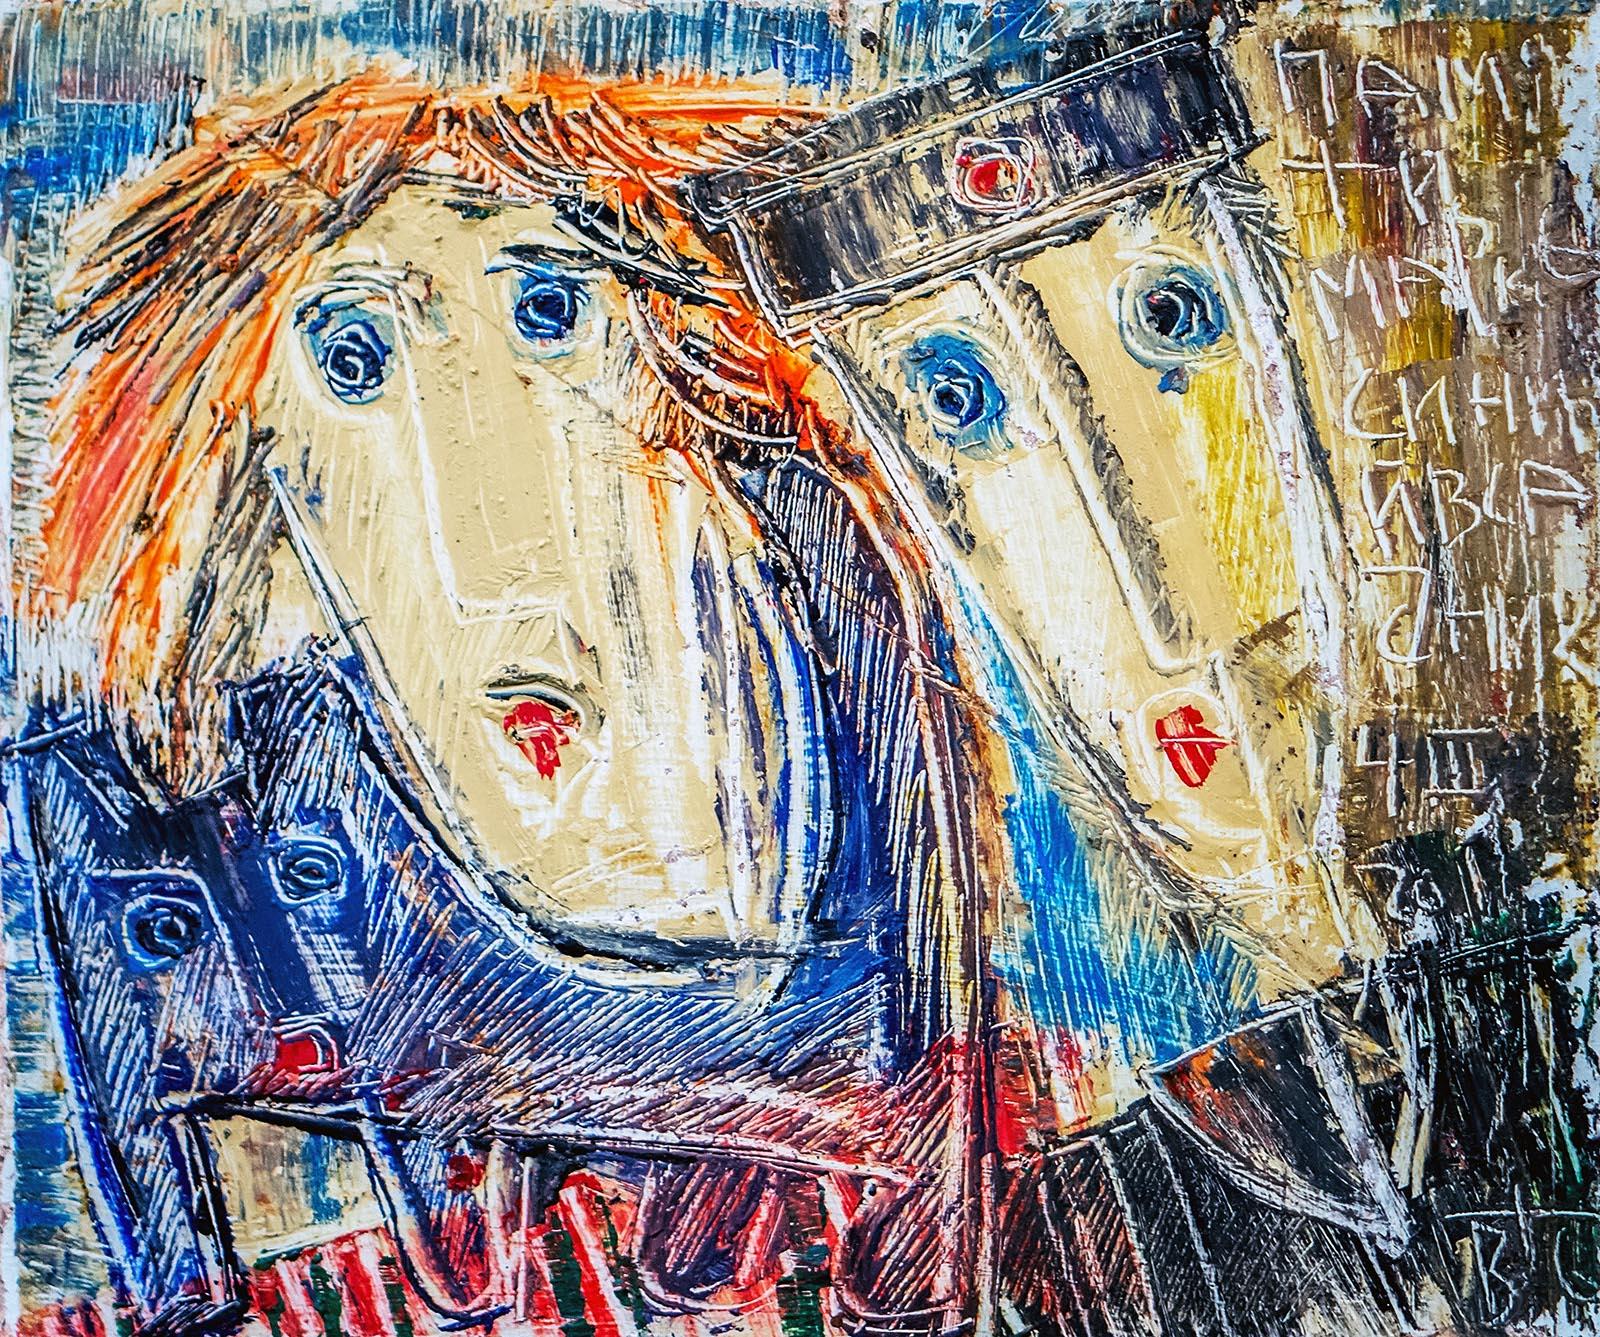 Фото №142151. Памяти Ф.Марка. Синий всадник. Виктор Тимофеев